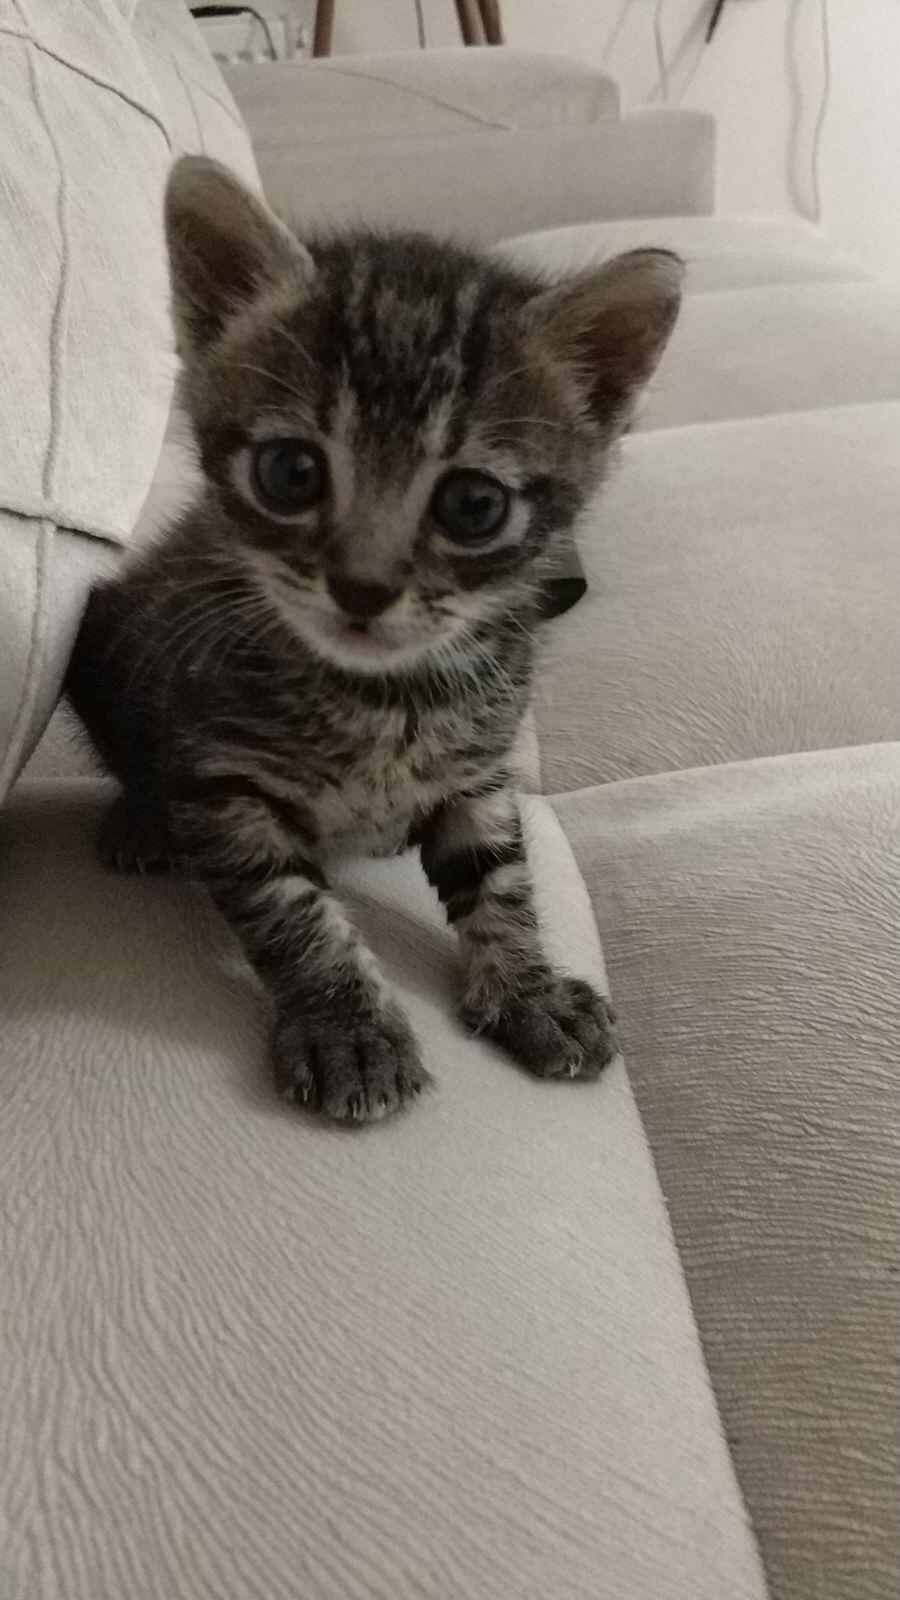 ÇOK ACİL (yavru kedi)